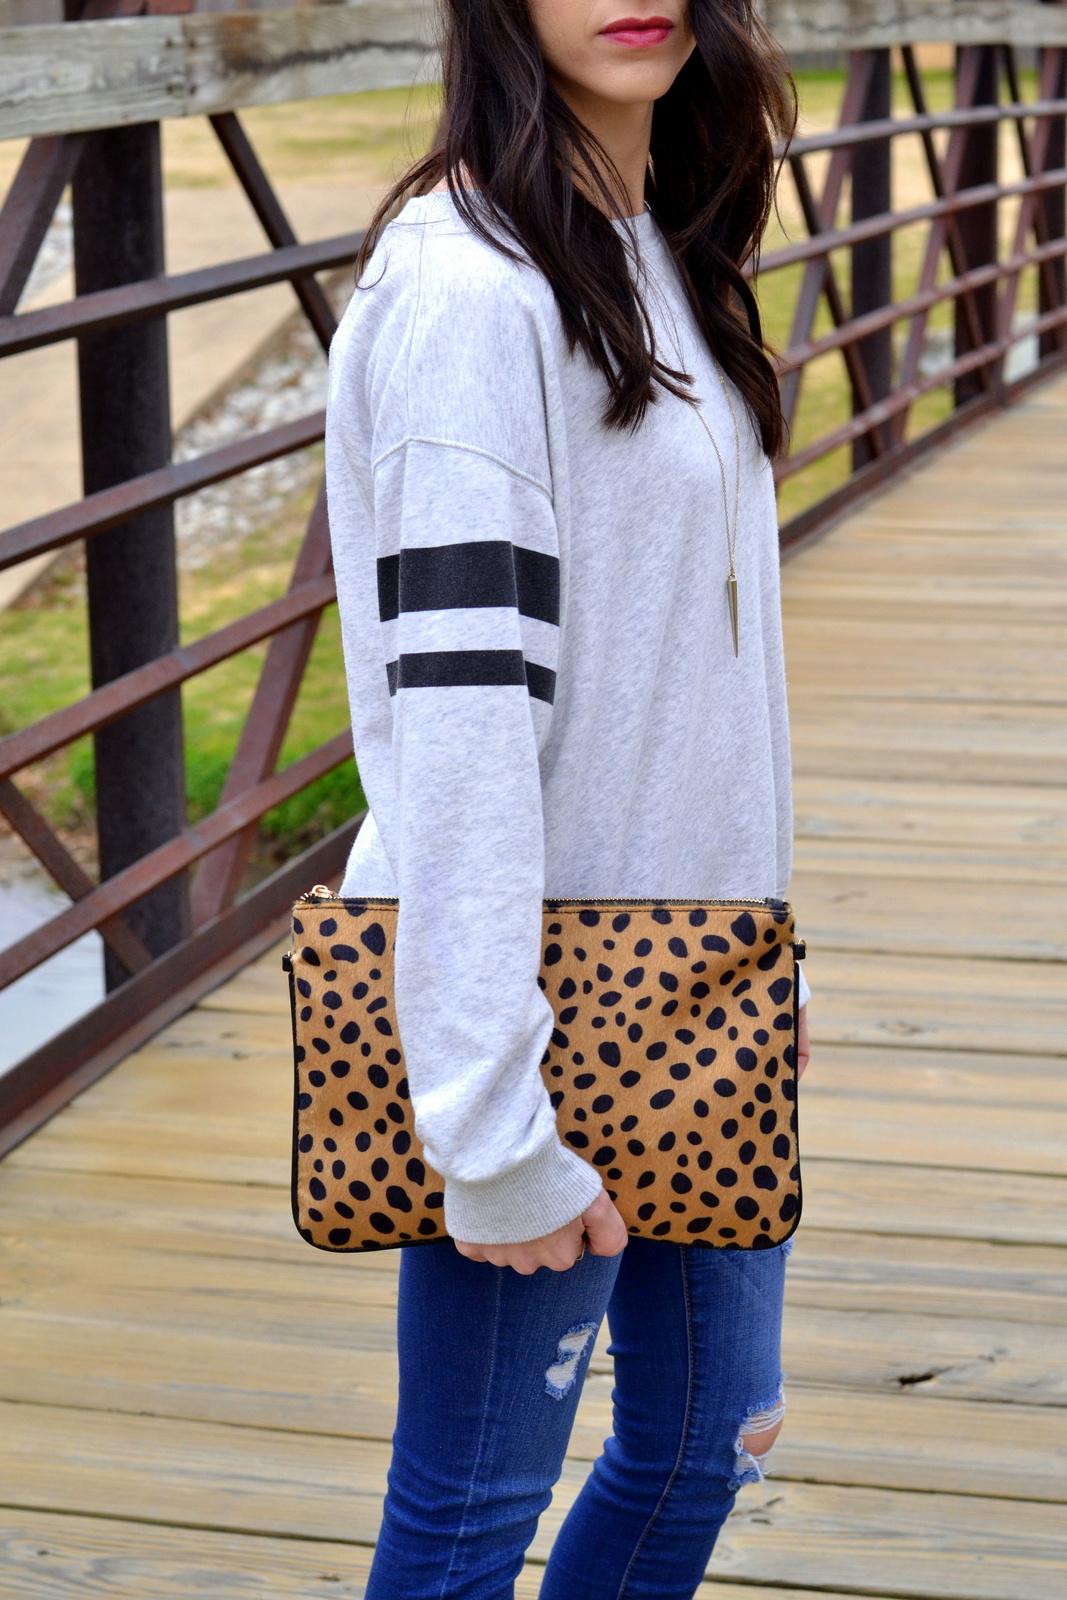 Casual_Sweatshirt_Leopard_Clutch_Details